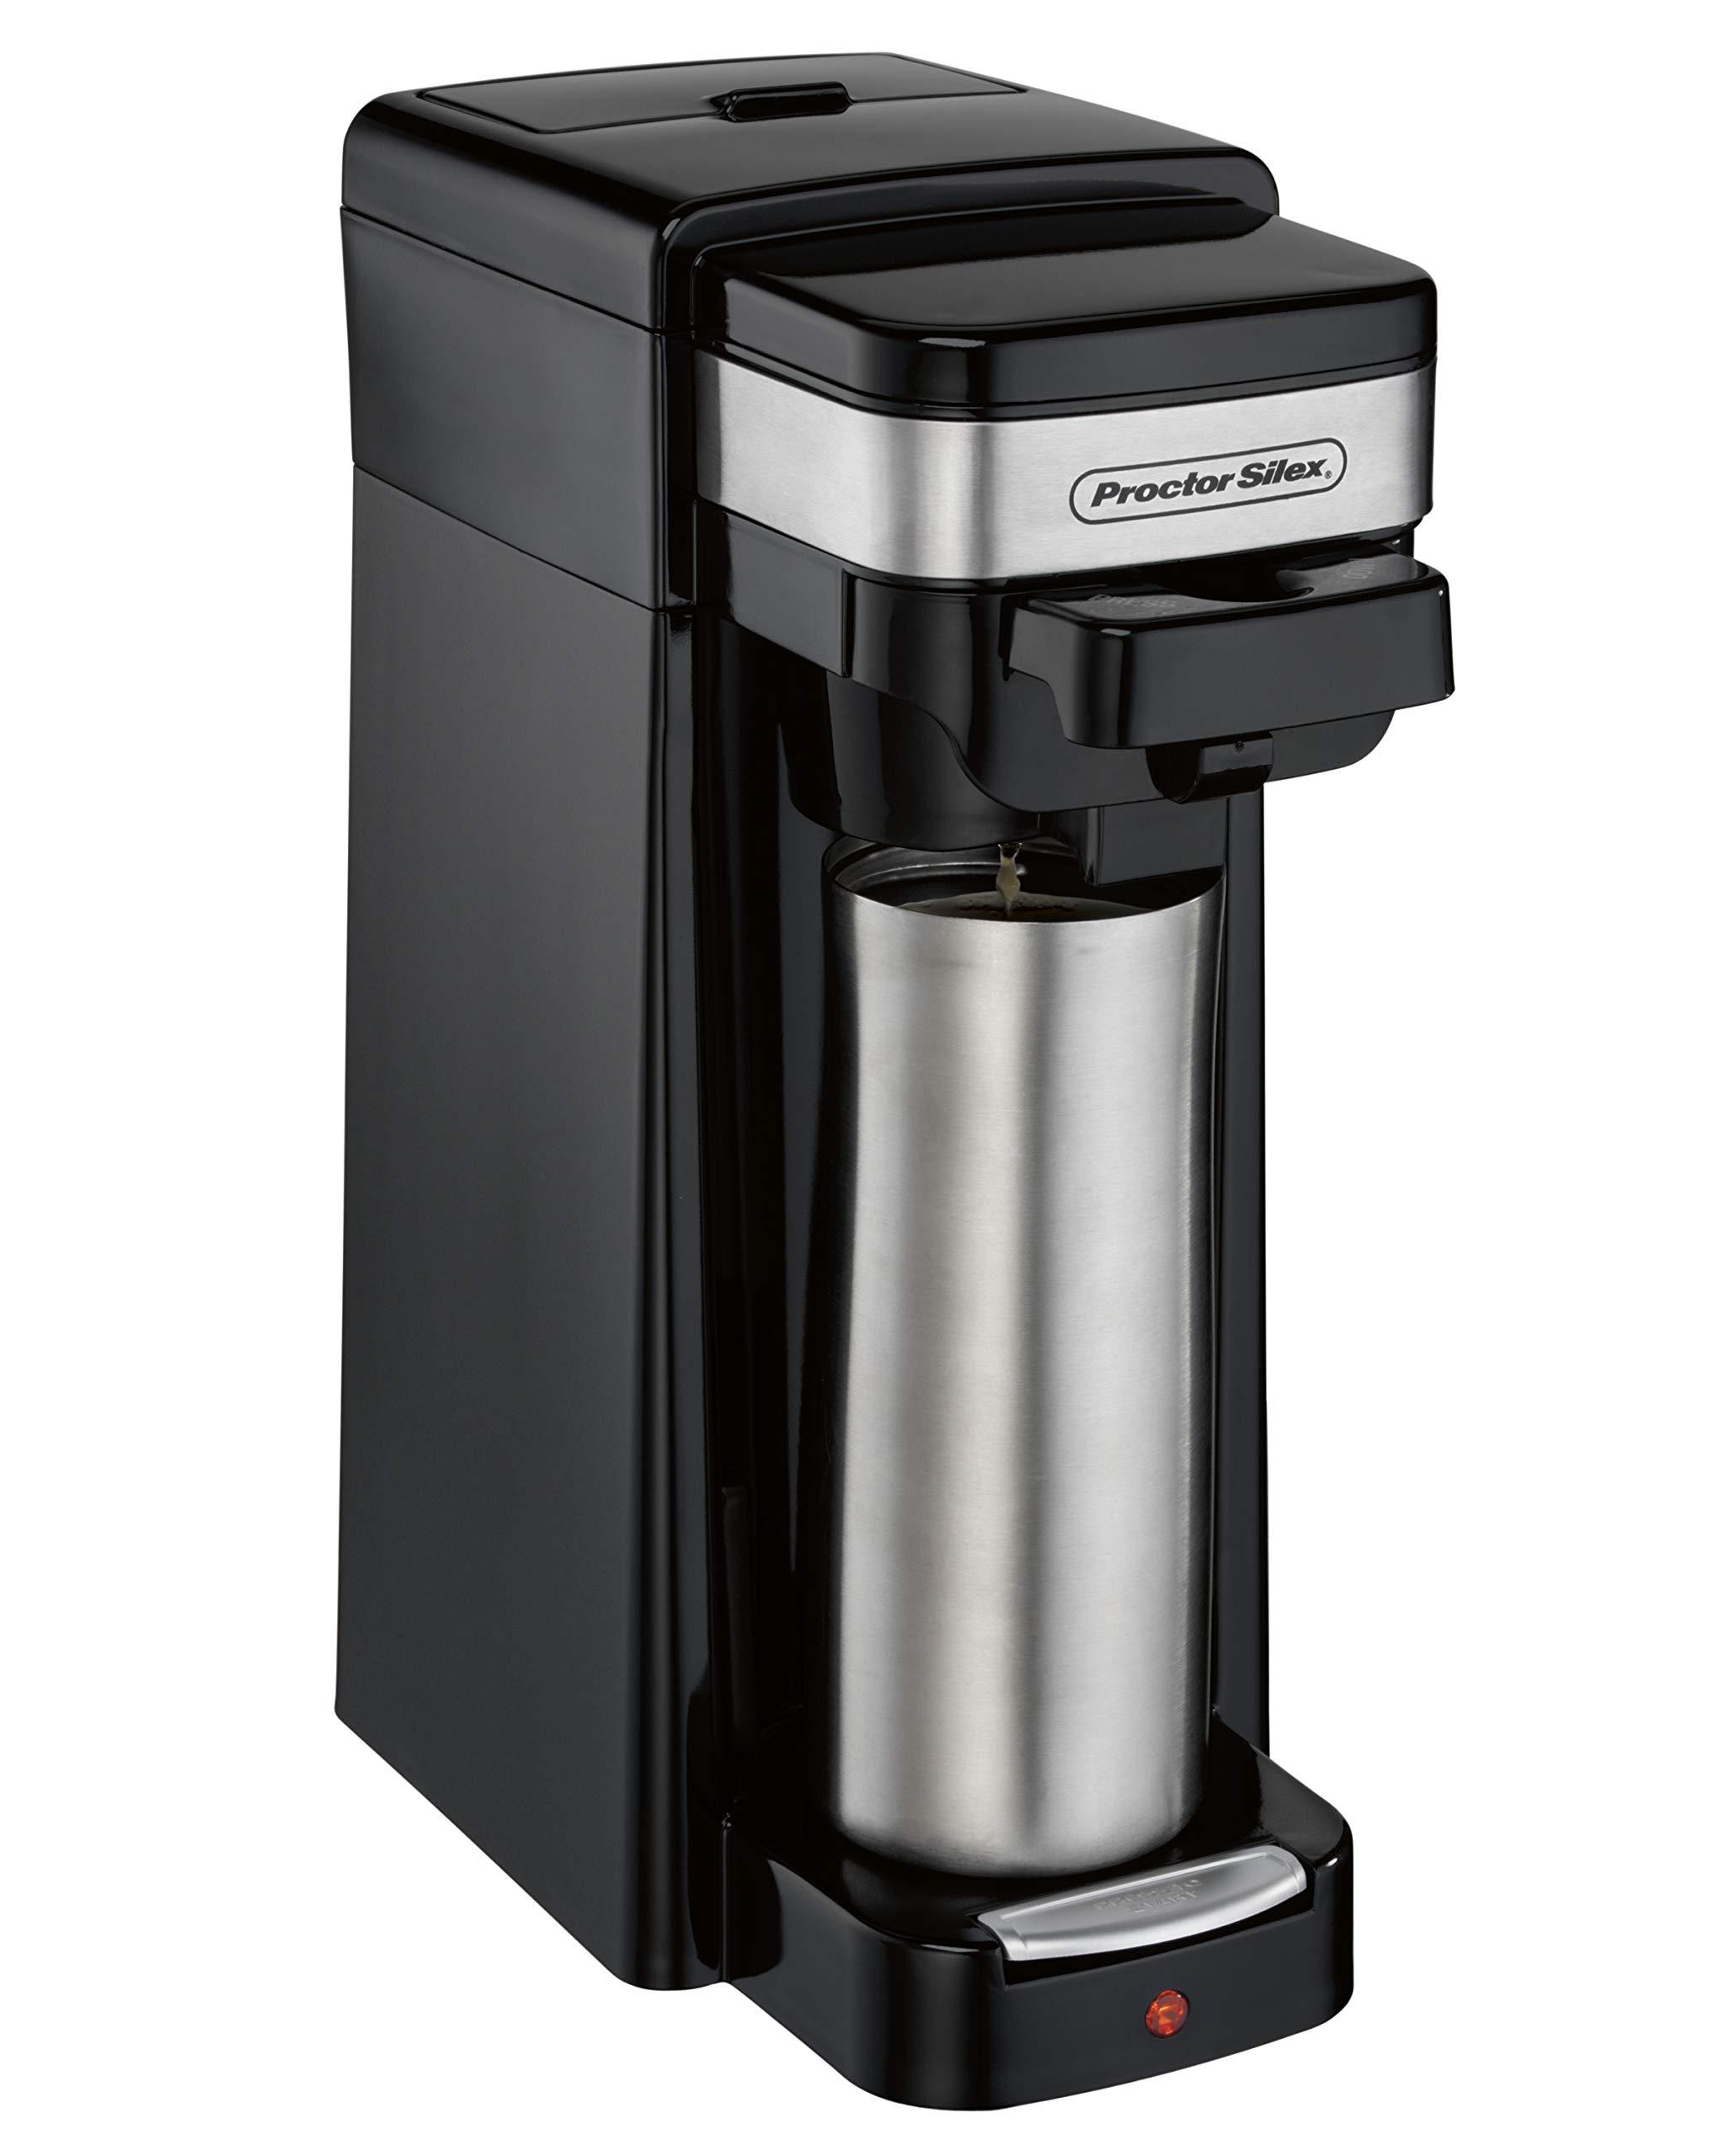 Hamilton Beach 49969 Single-Serve Coffee Maker, Use with Grounds and Pod Packs, Fits a Travel Mug by Hamilton Beach